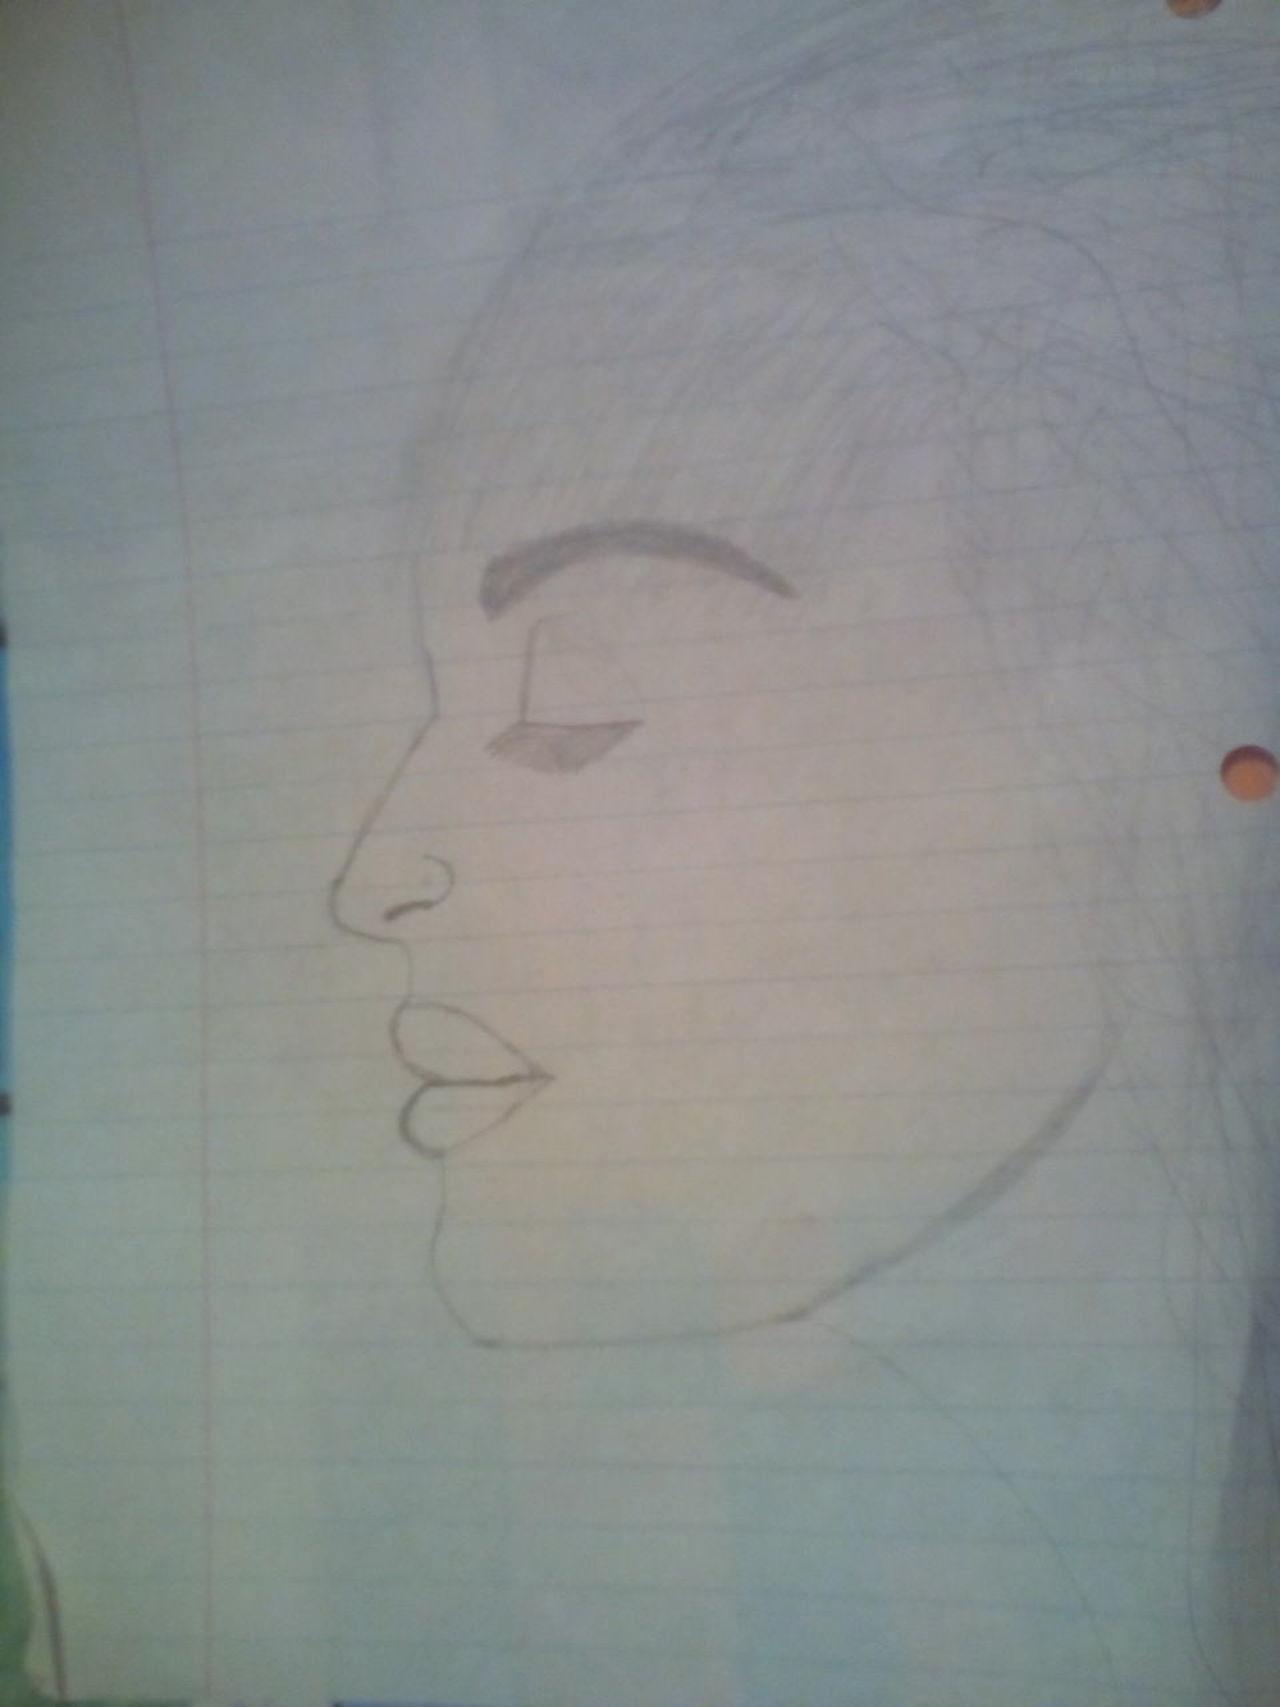 My drawing. Drawing Drawing Of A Woman No Color Pencil And Paper Woman Drawing ✏Art My Drawing Drawing, Painting, Artwork Hand Drawn